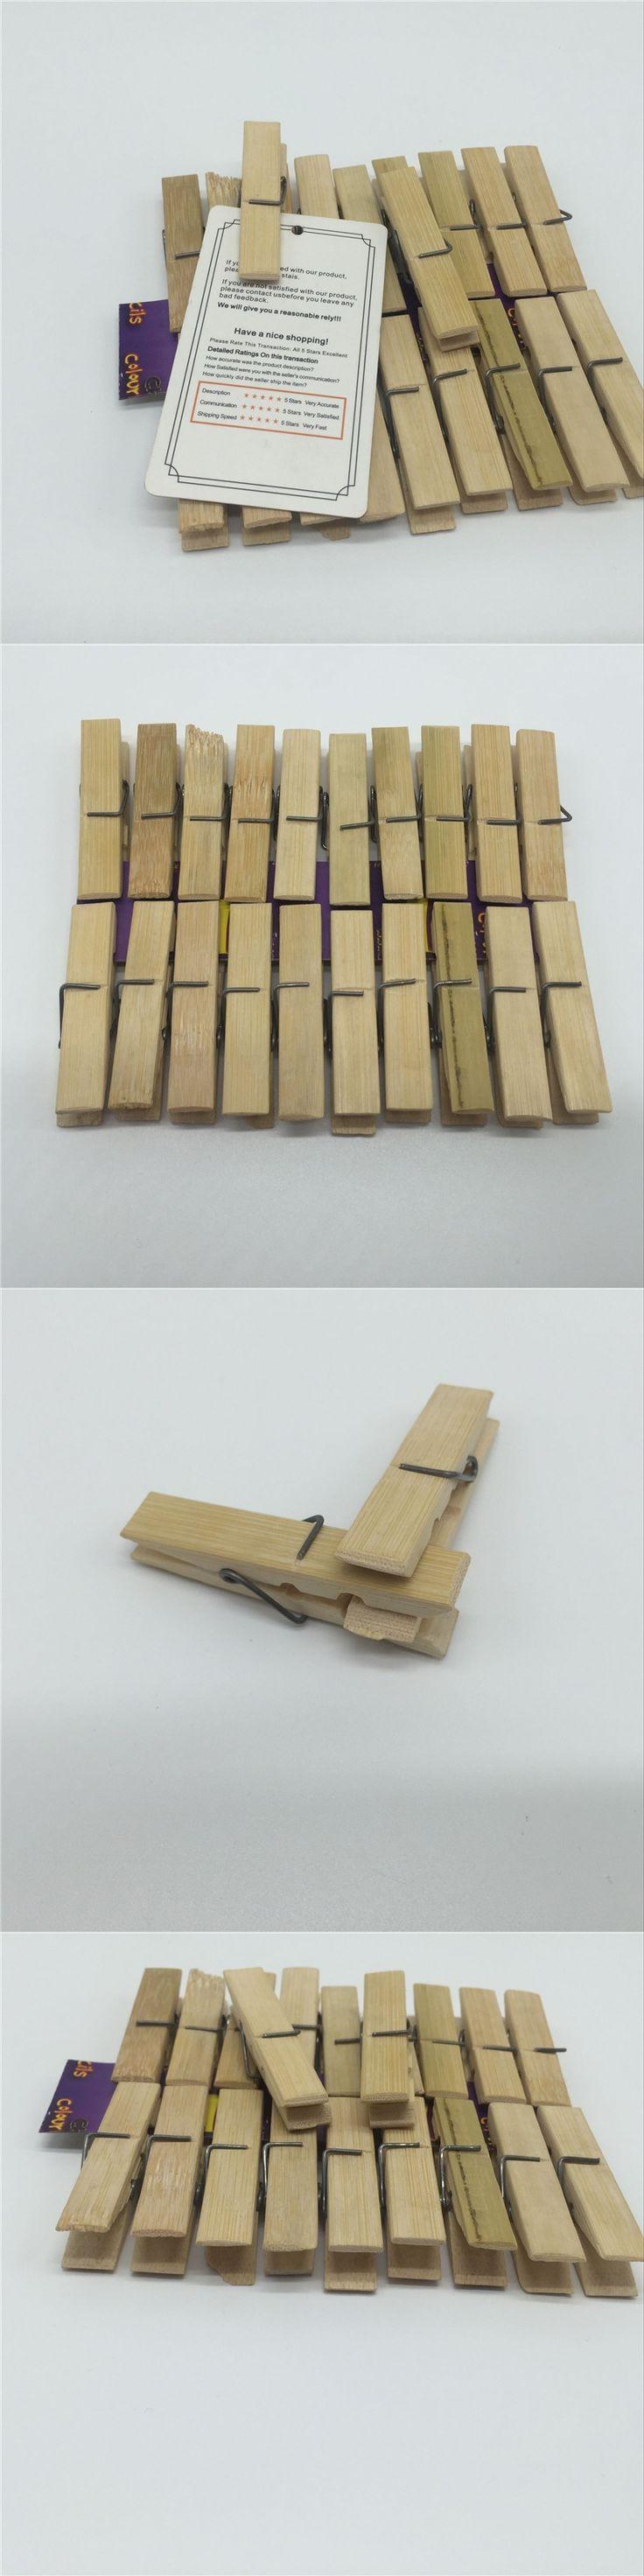 20PCS  bamboo wooden laundry peg clothespin Oizumi Laundry Clothes Pins  regular size